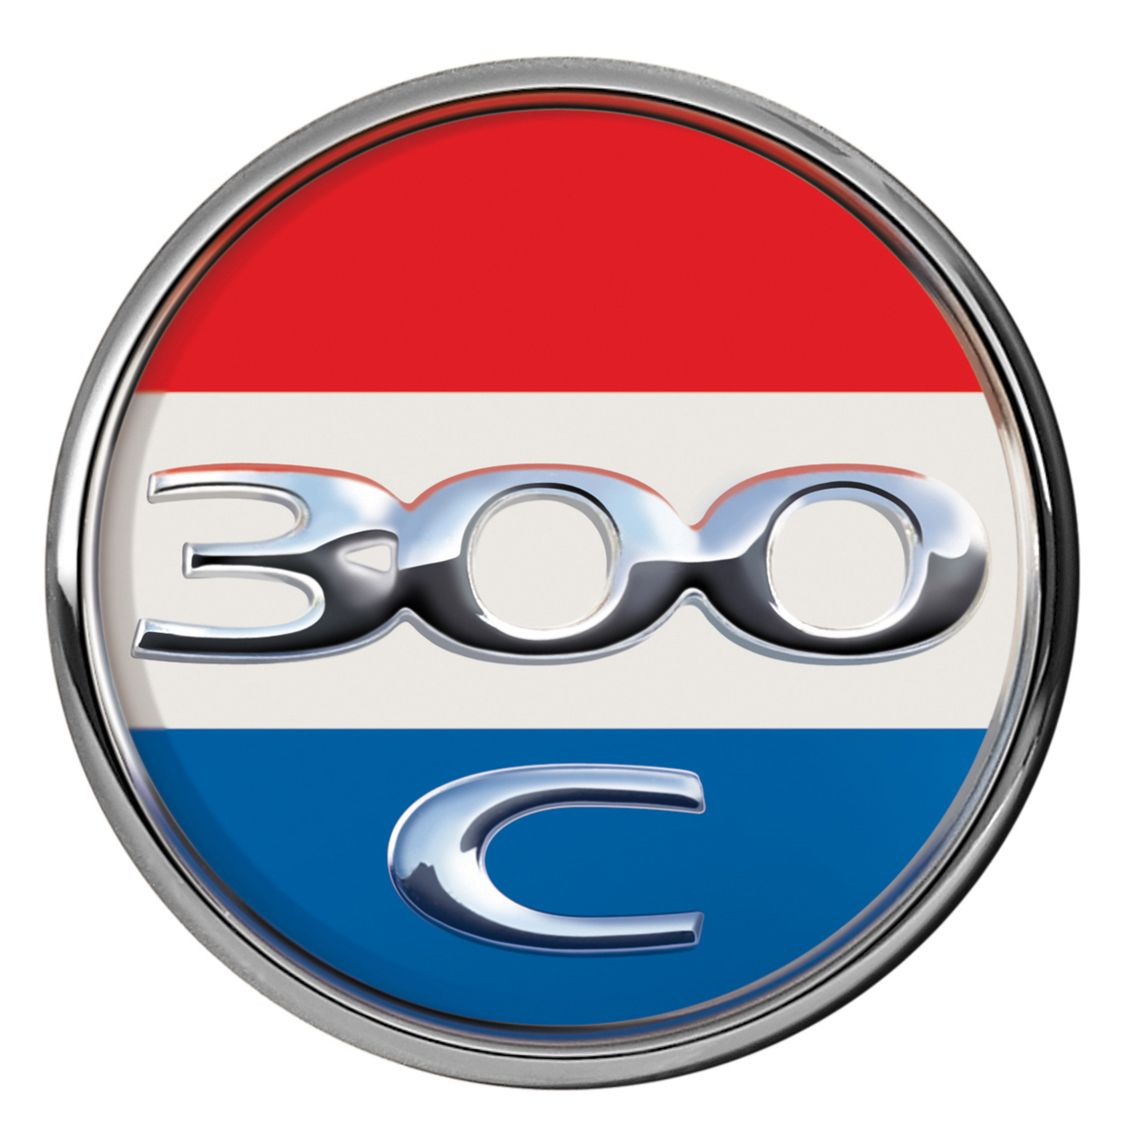 Chrysler 300 logo chrysler imperial desoto other larger chrysler 300 logo biocorpaavc